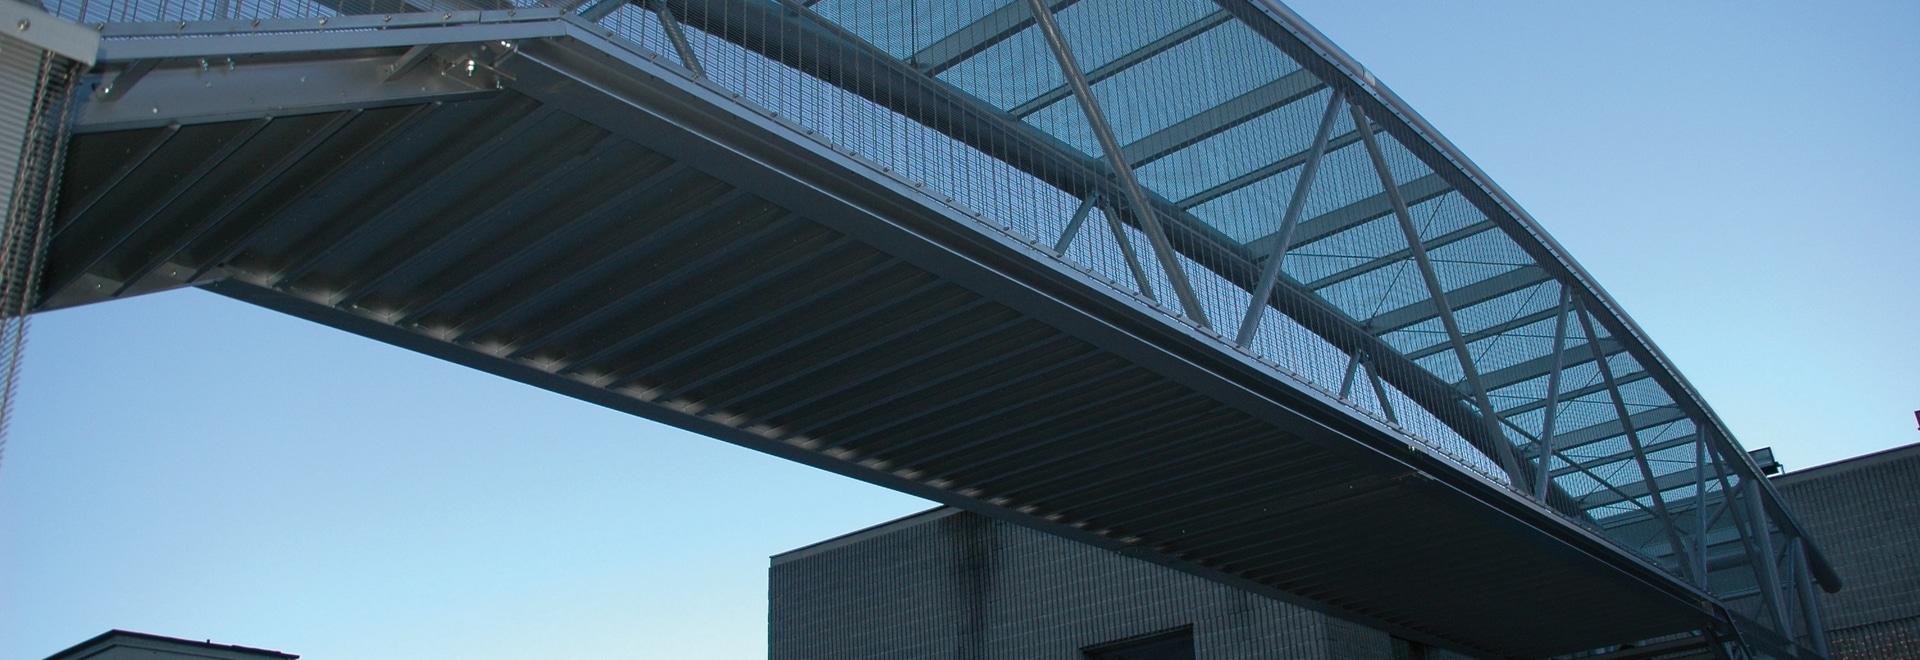 puente peatonal Carcano